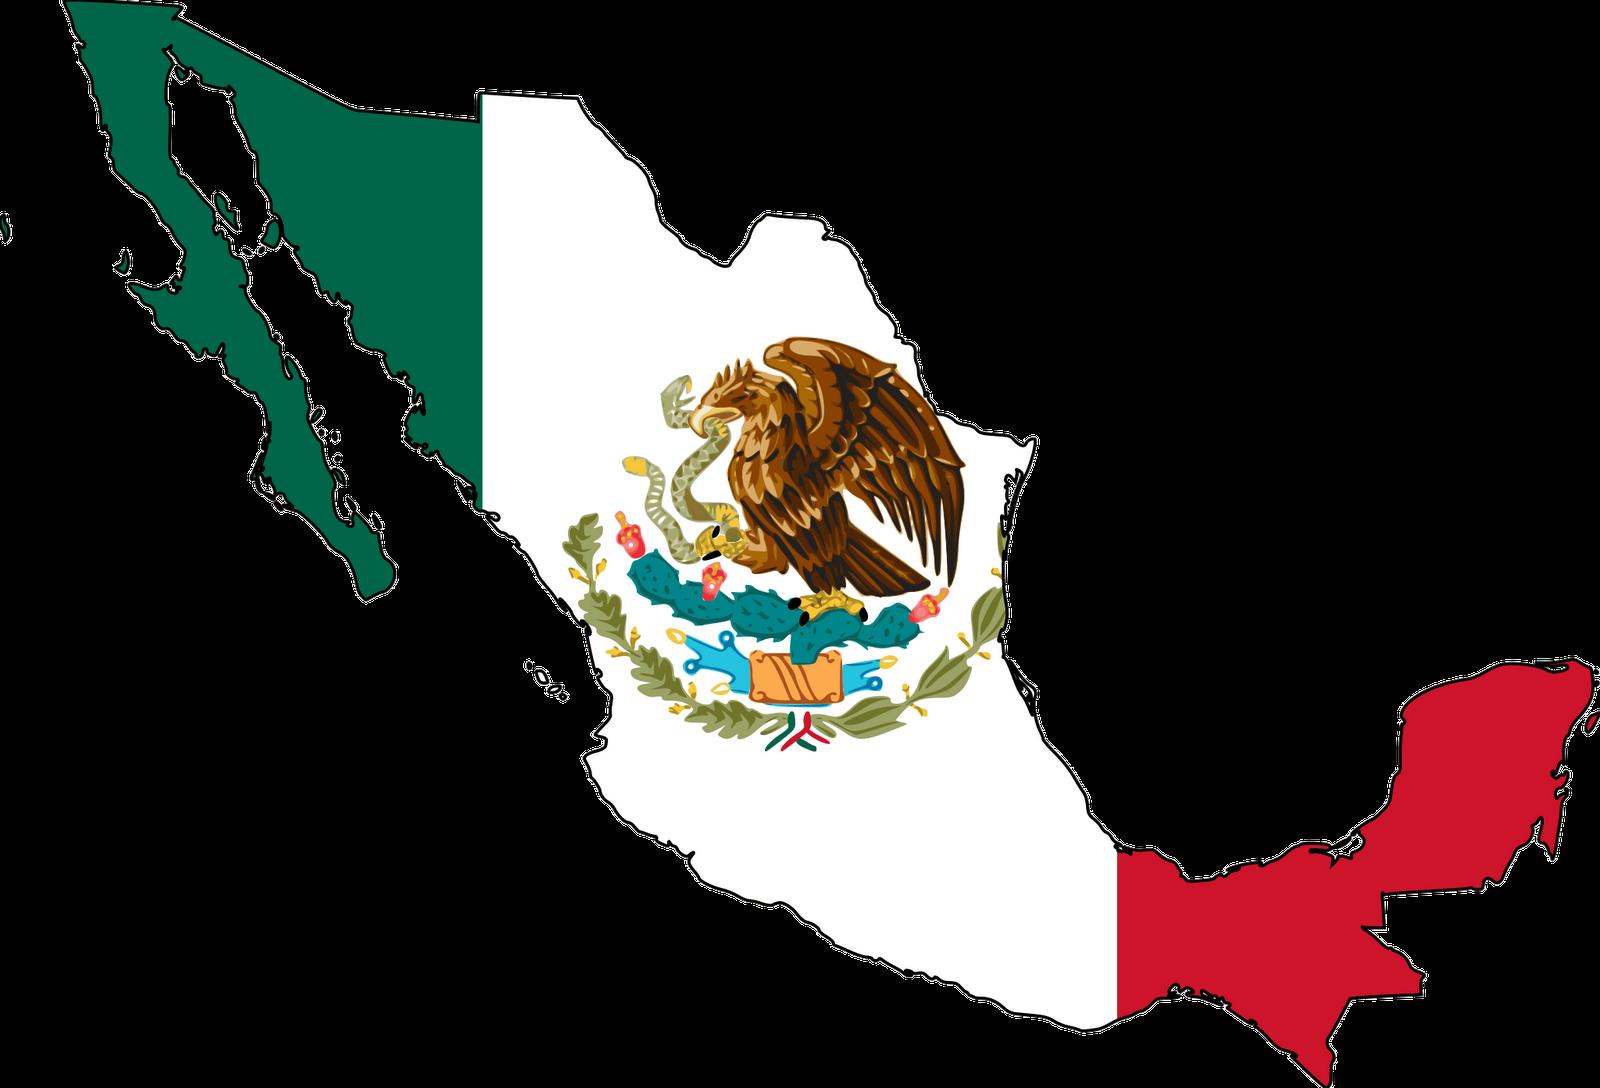 free clip art maps mexico flag 071511 clip art m xico rh pinterest com mexican flag clipart black and white mexico flag clipart black and white